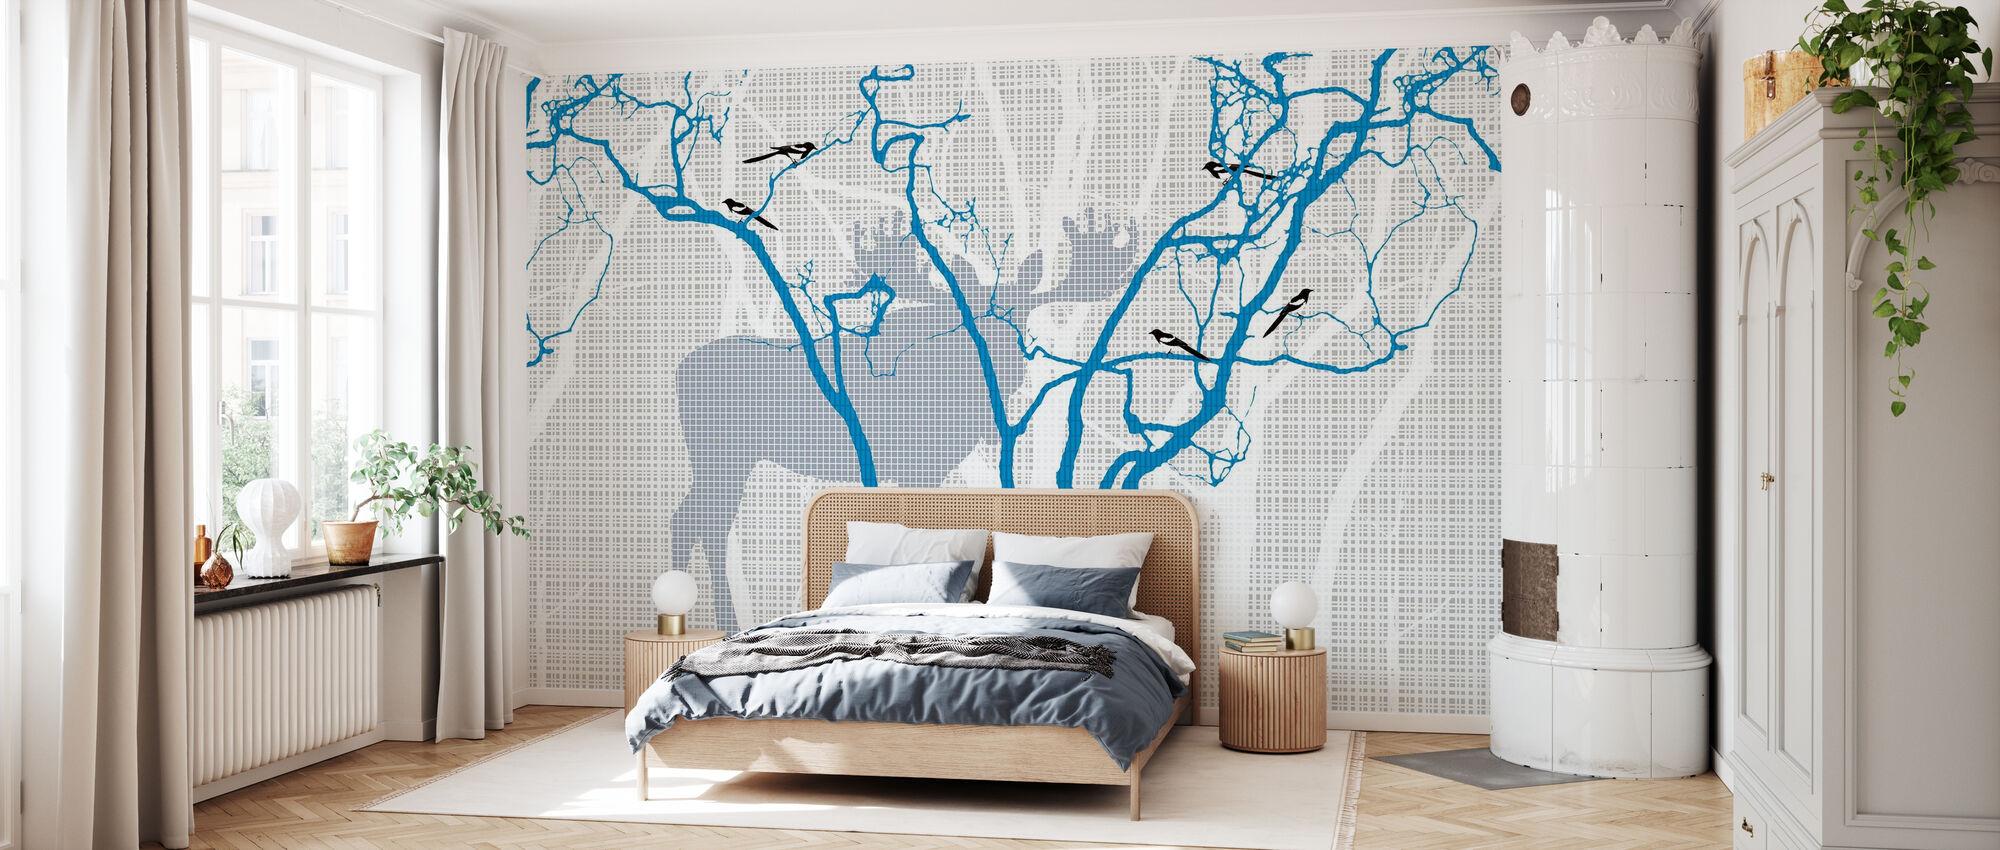 Rhubarbe - Bleu Indigo - Papier peint - Chambre